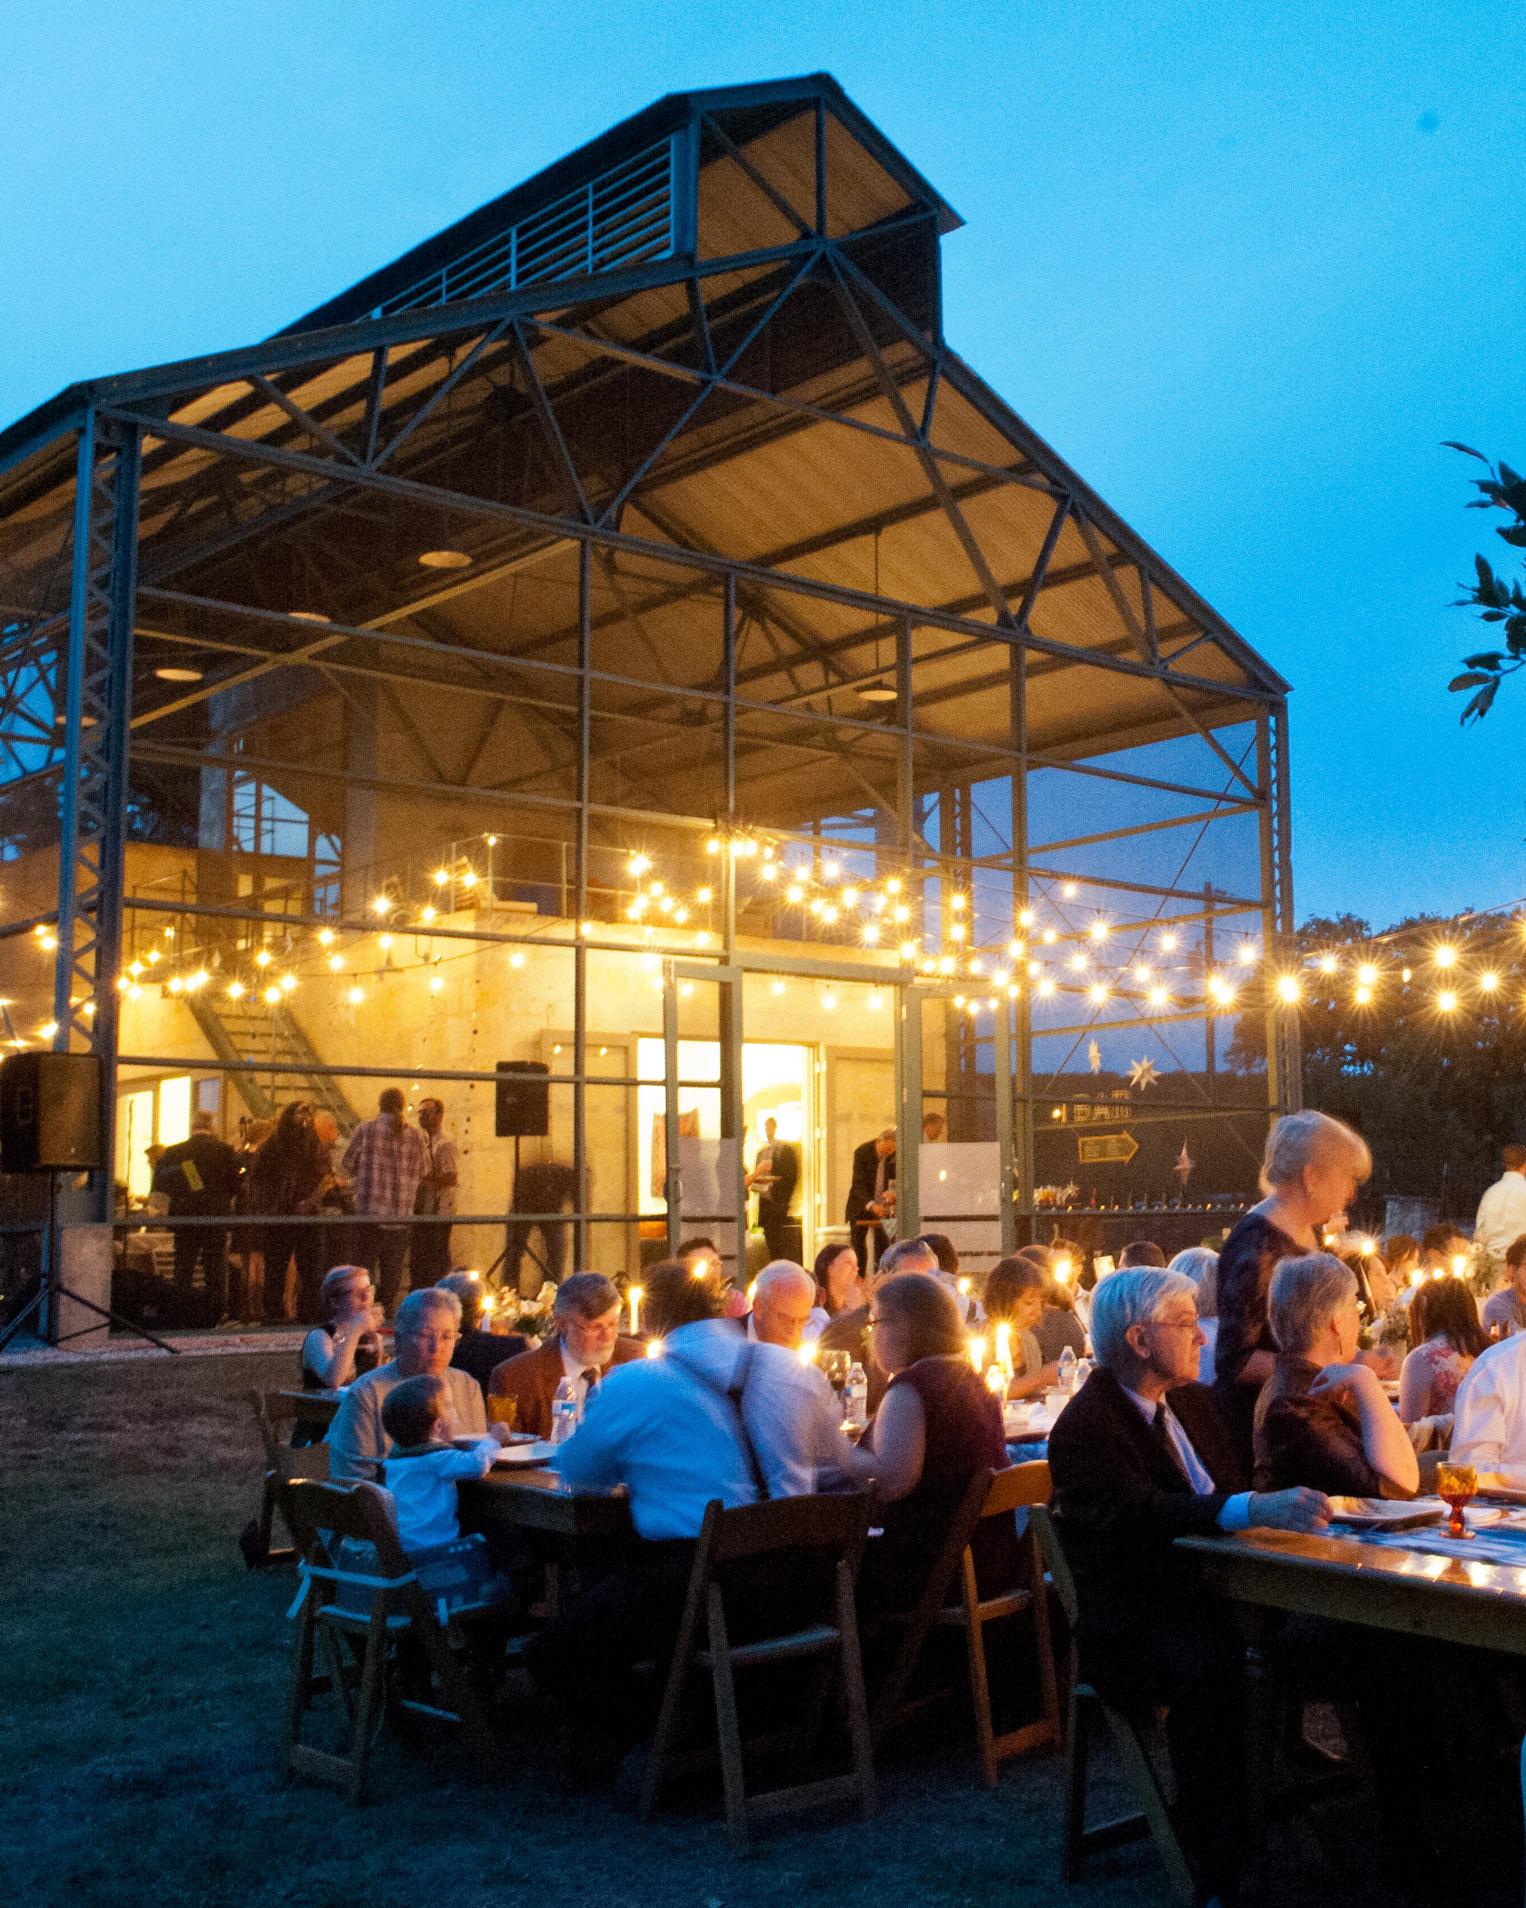 abby-chris-wedding-texas-reception-lighting-0565-s112832-0516.jpg